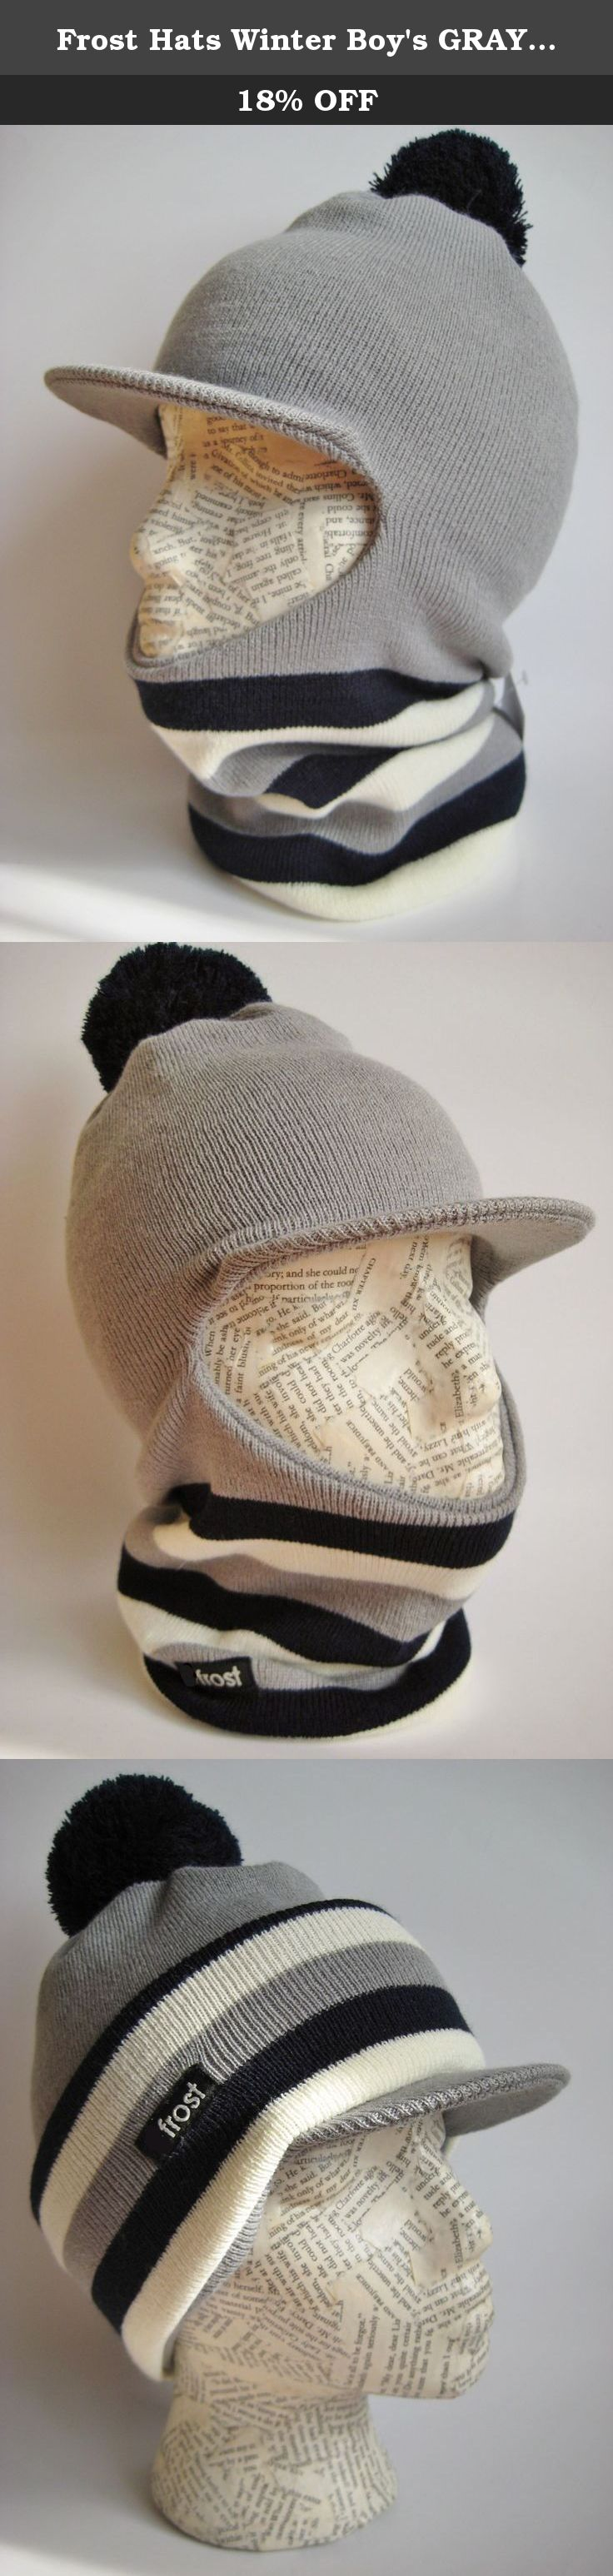 75f6b5ae592 Frost Hats Winter Boy s GRAY Hat Balaclava Ski Mask Narrow Stripes Knit  Frost Hats Gray.